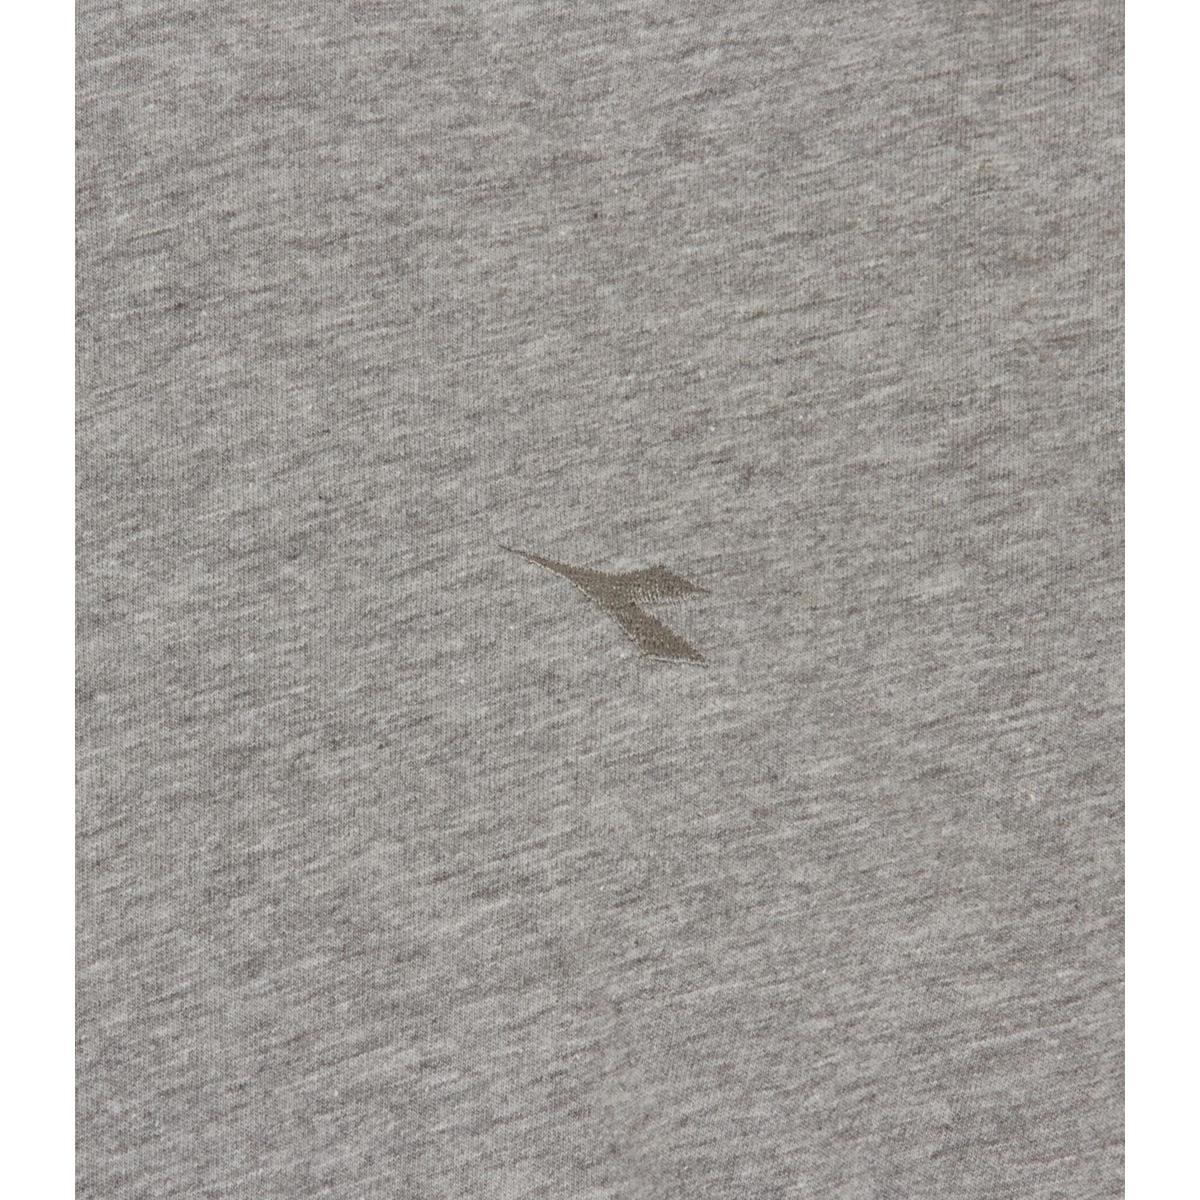 T-shirt Diadora SS T-SHIRT girocollo da uomo rif. 102.171675